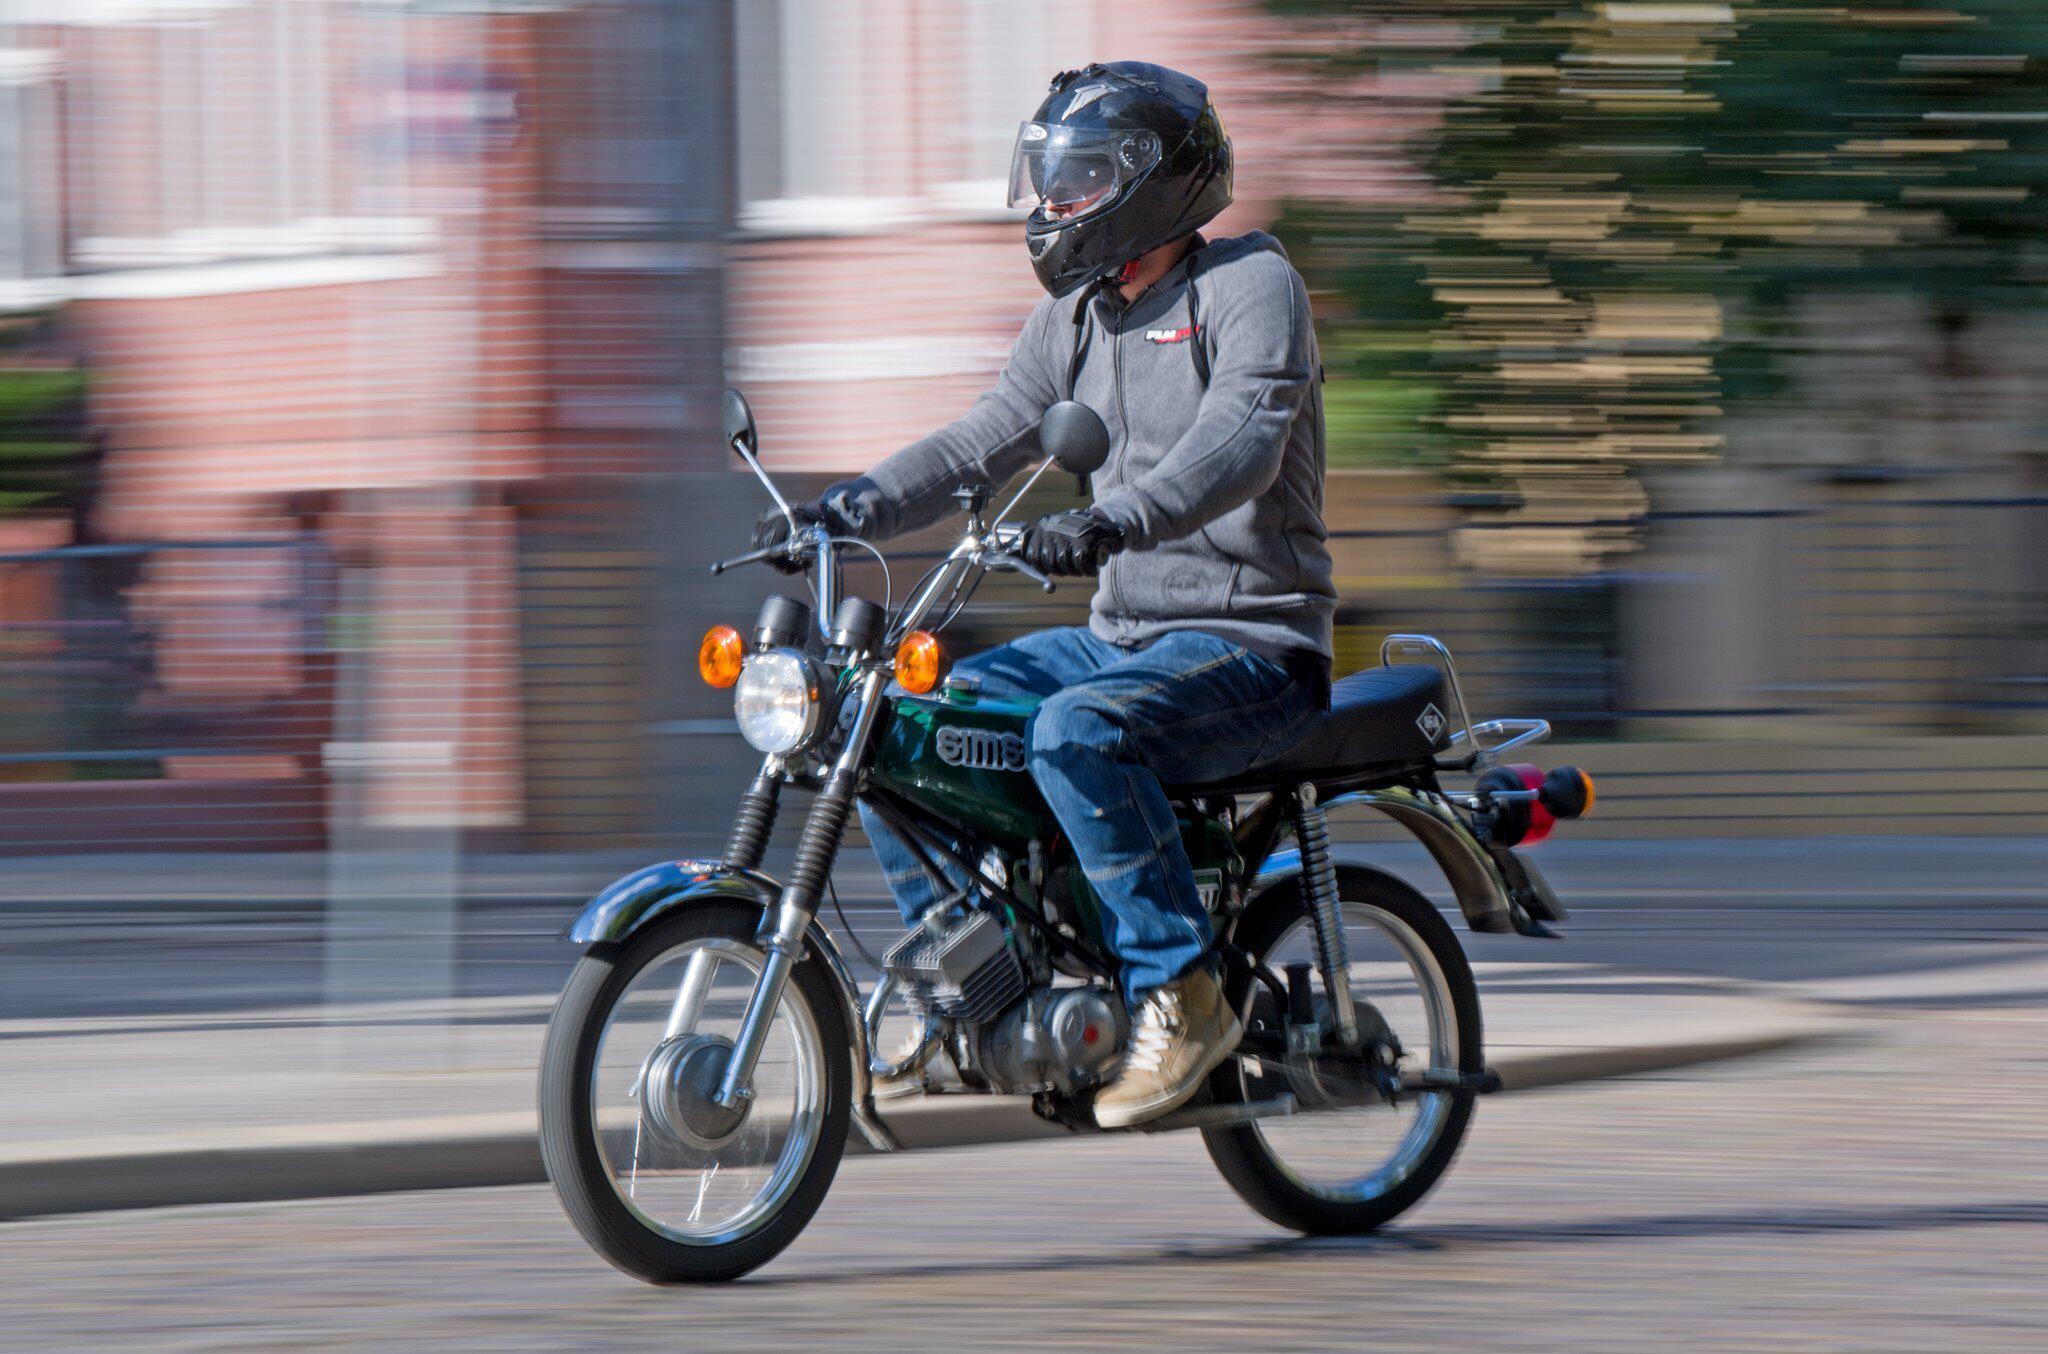 Bild zu Moped